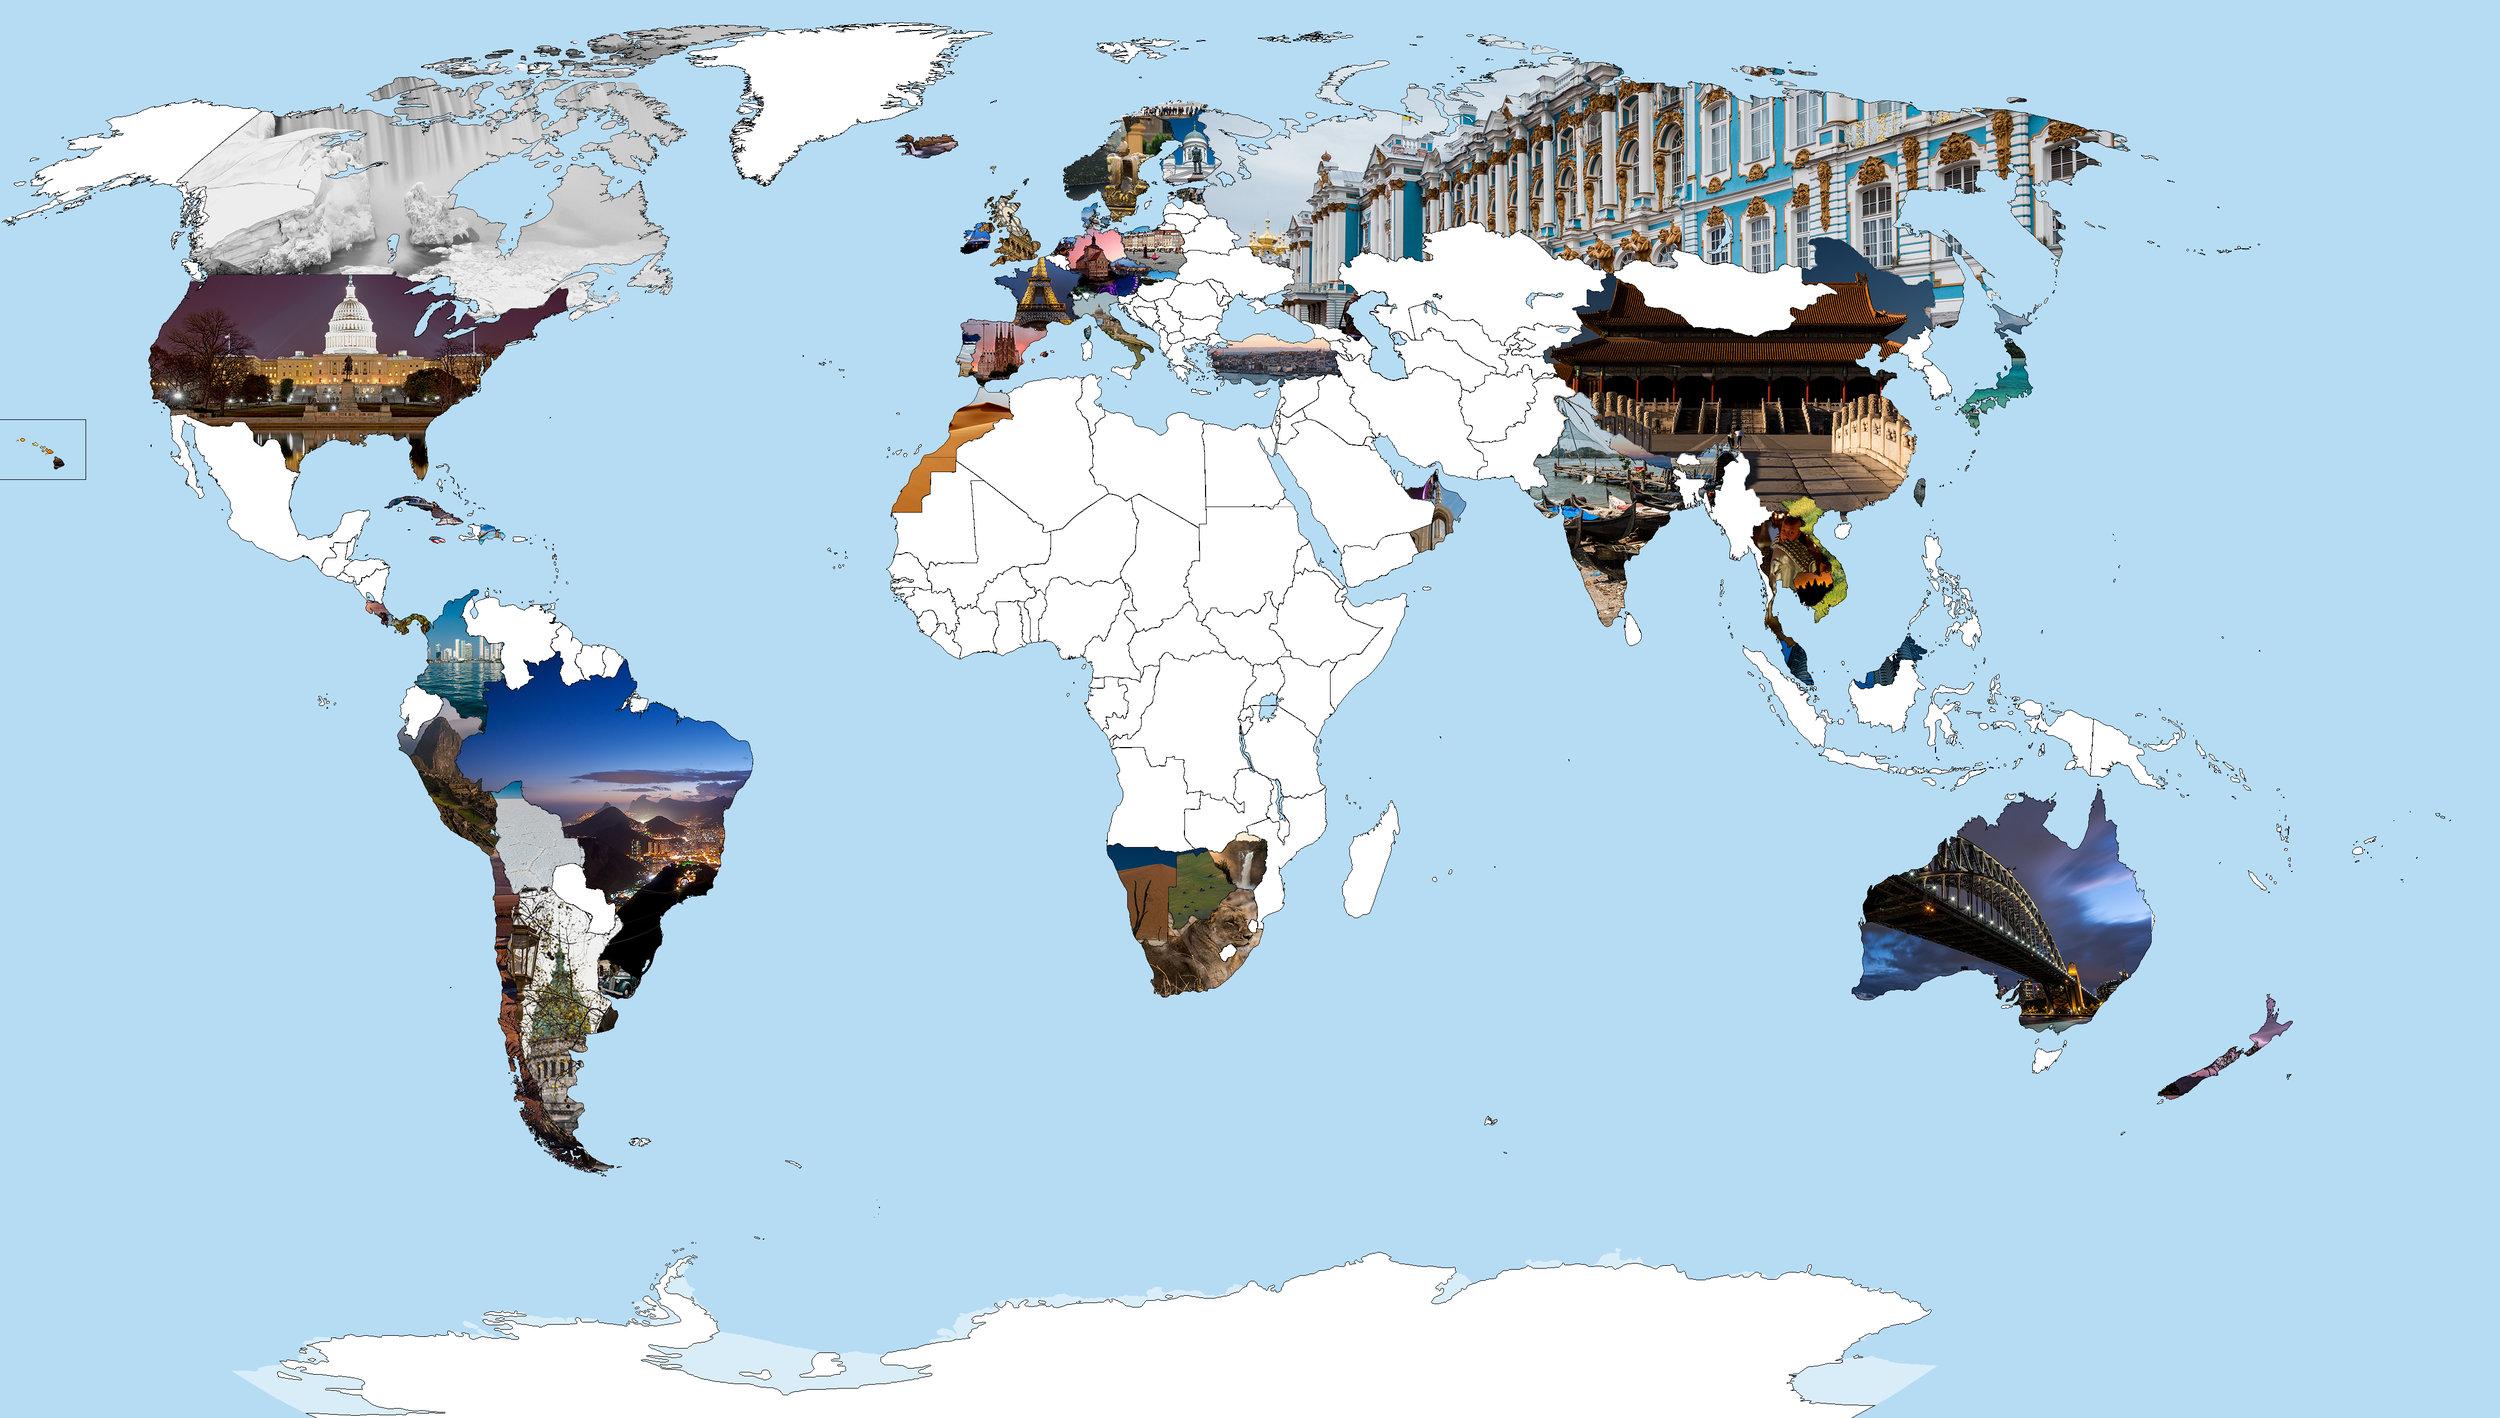 Worldmap201802.jpg